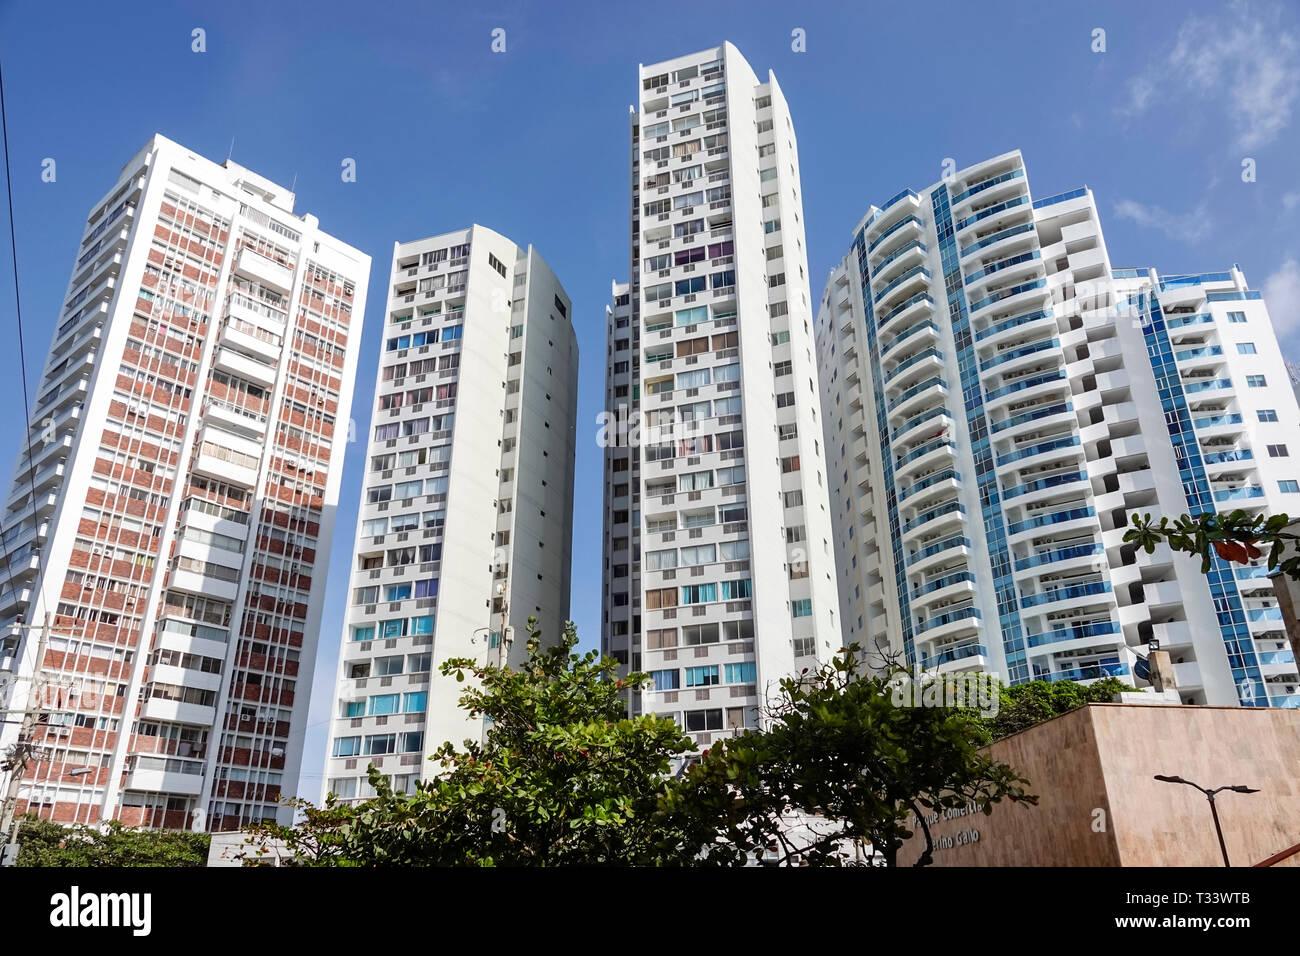 Cartagena Colombia El Lagito high rise apartment condominium buildings high density residential neighborhood modern architecture - Stock Image